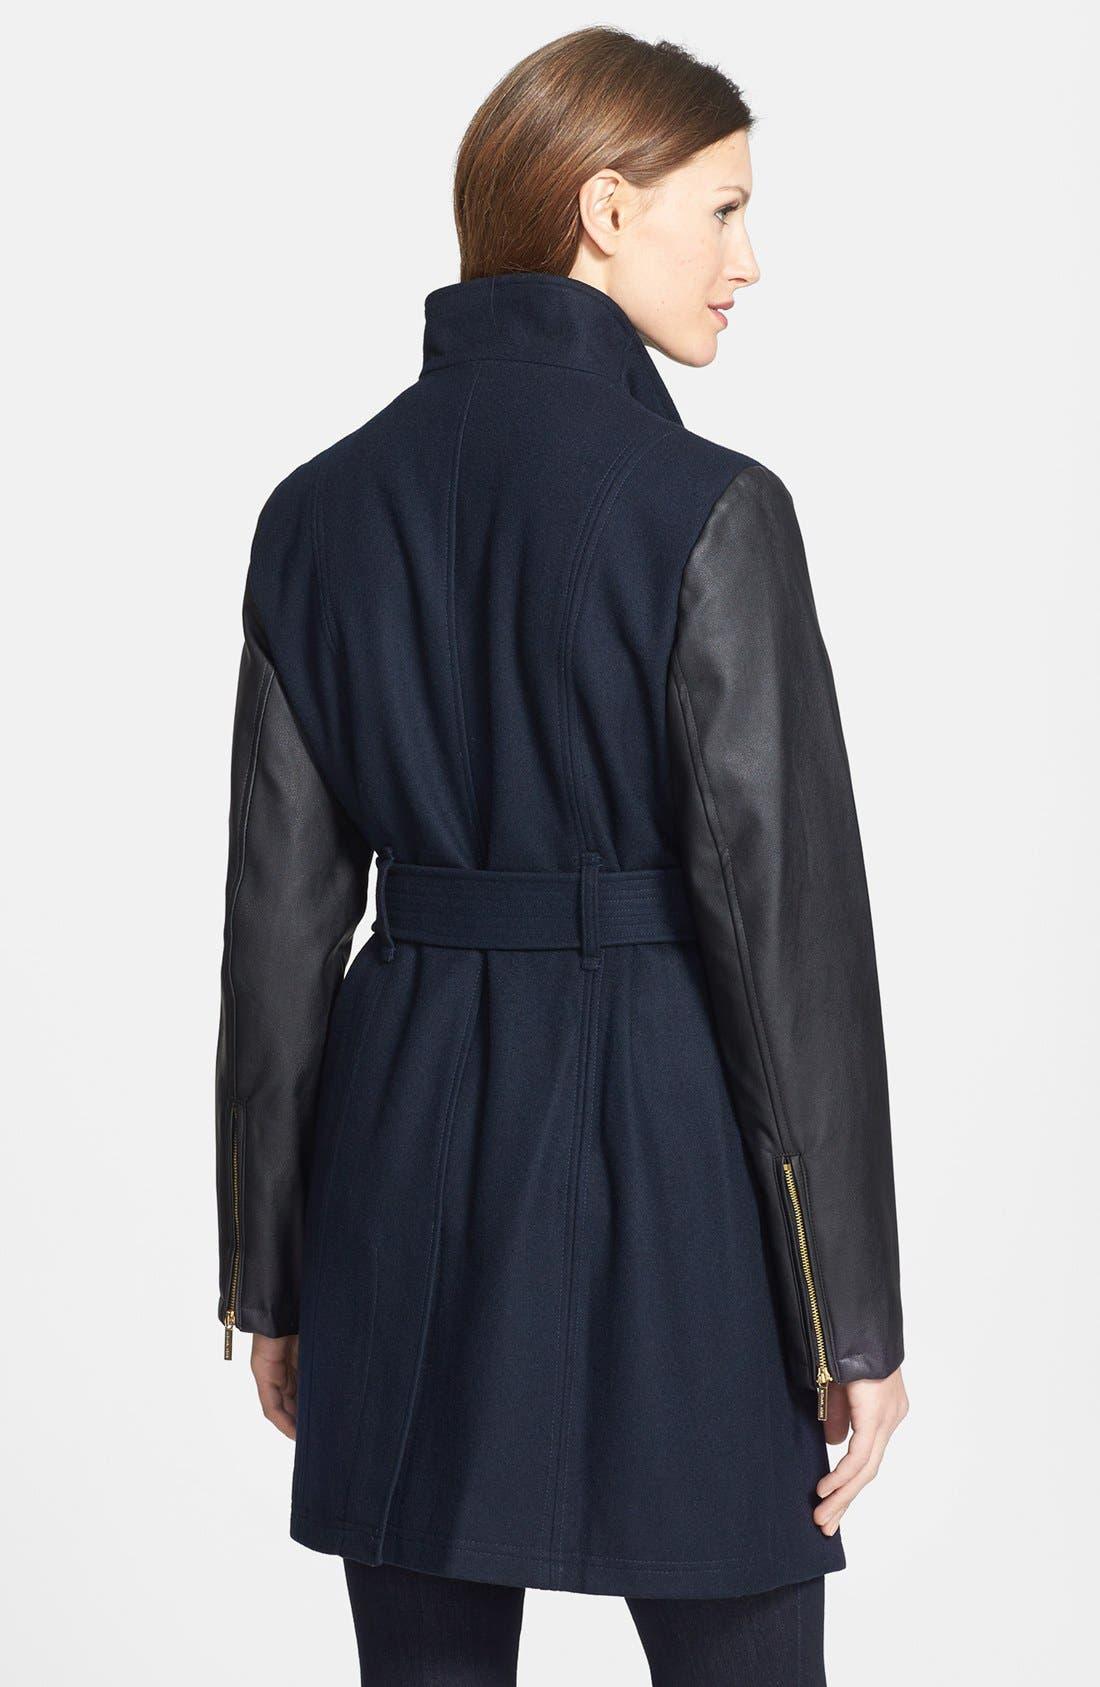 Wool Blend & Faux Leather Coat,                             Alternate thumbnail 3, color,                             410